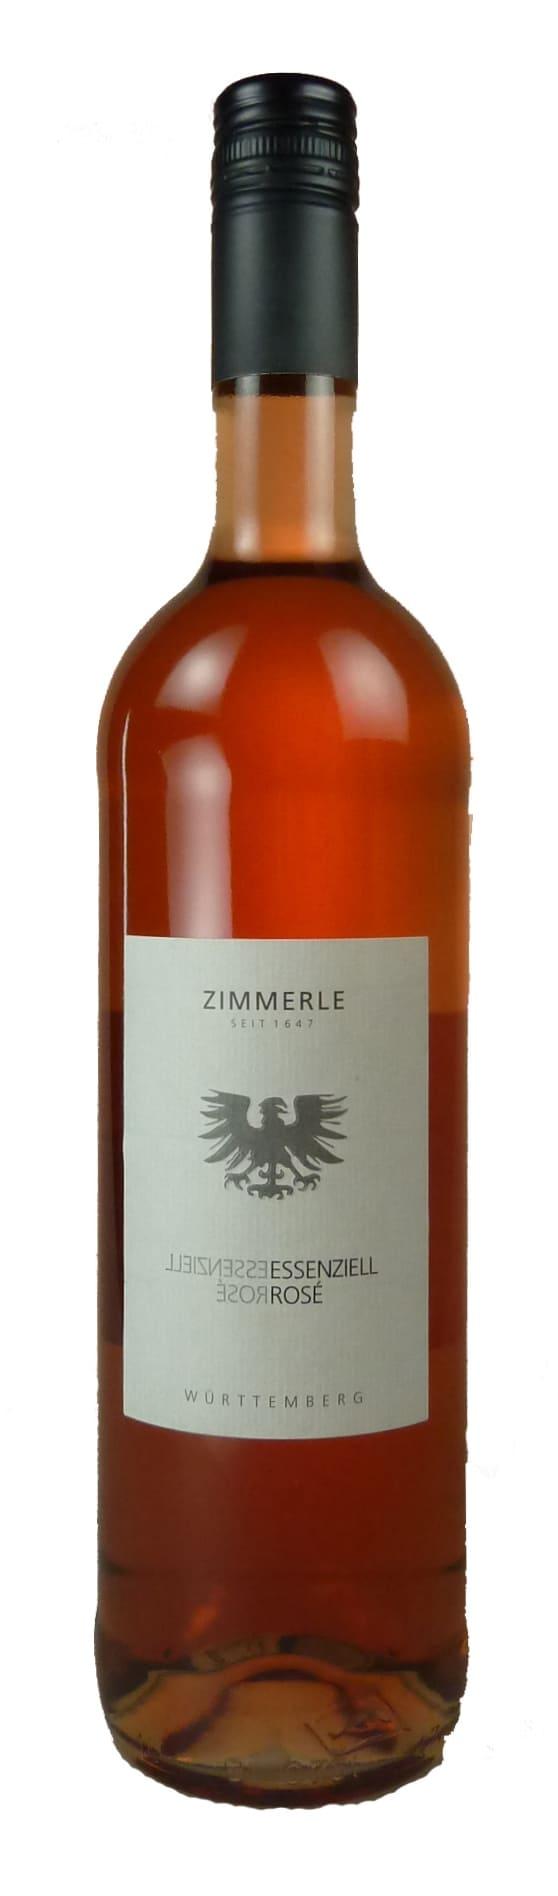 Essenziell Rosé Qualitätswein trocken 2017